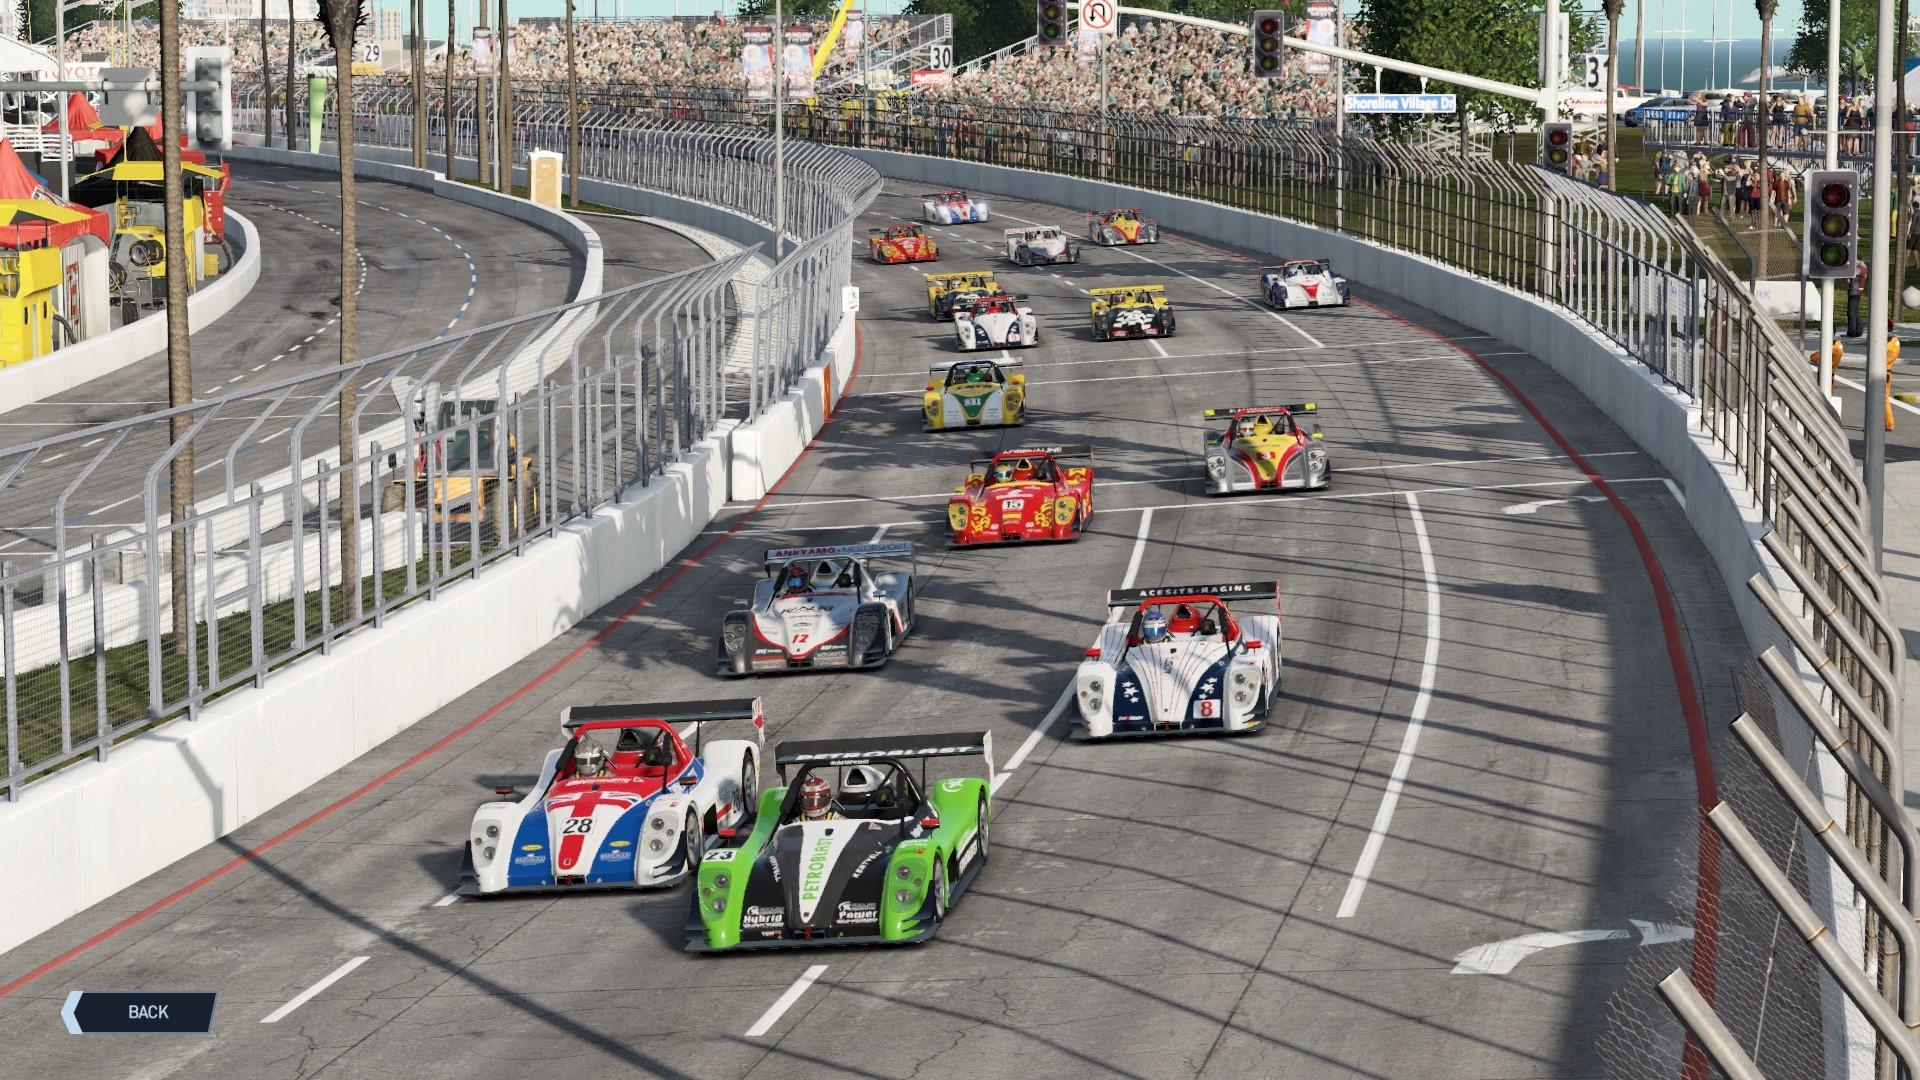 Project Cars 2 – Radical SR3 Bajnokság